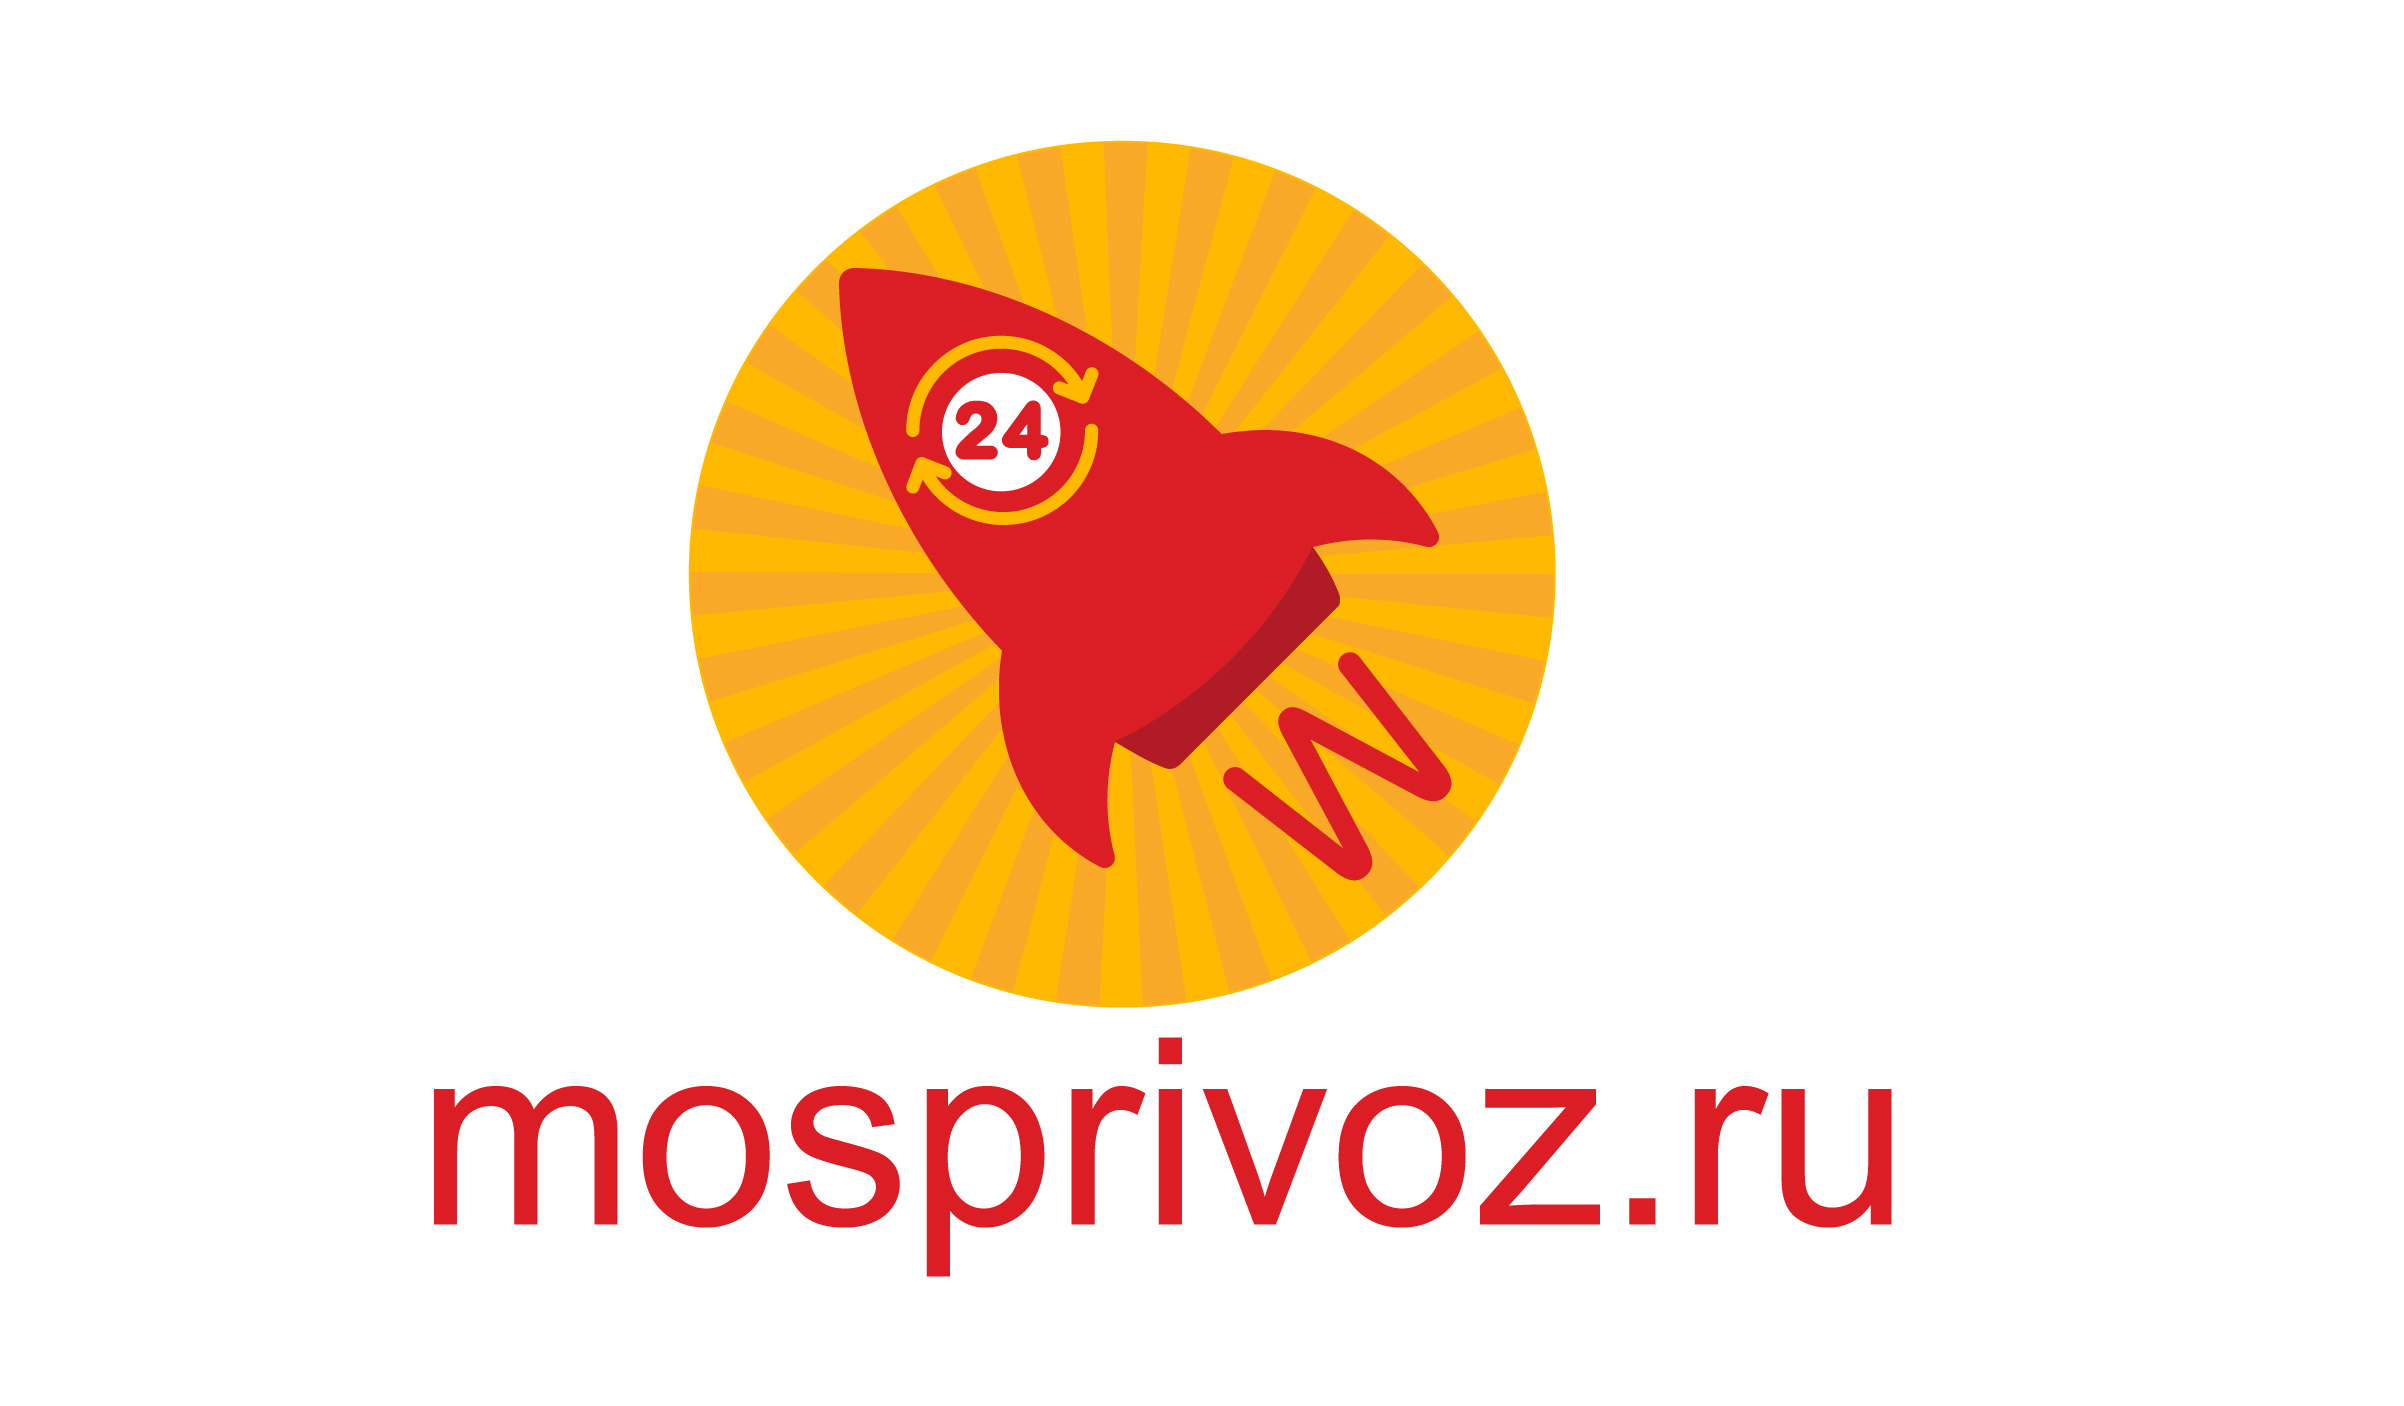 Логотип. Интернет - магазин по доставке продуктов питания. фото f_0885ada43b3801a9.jpg